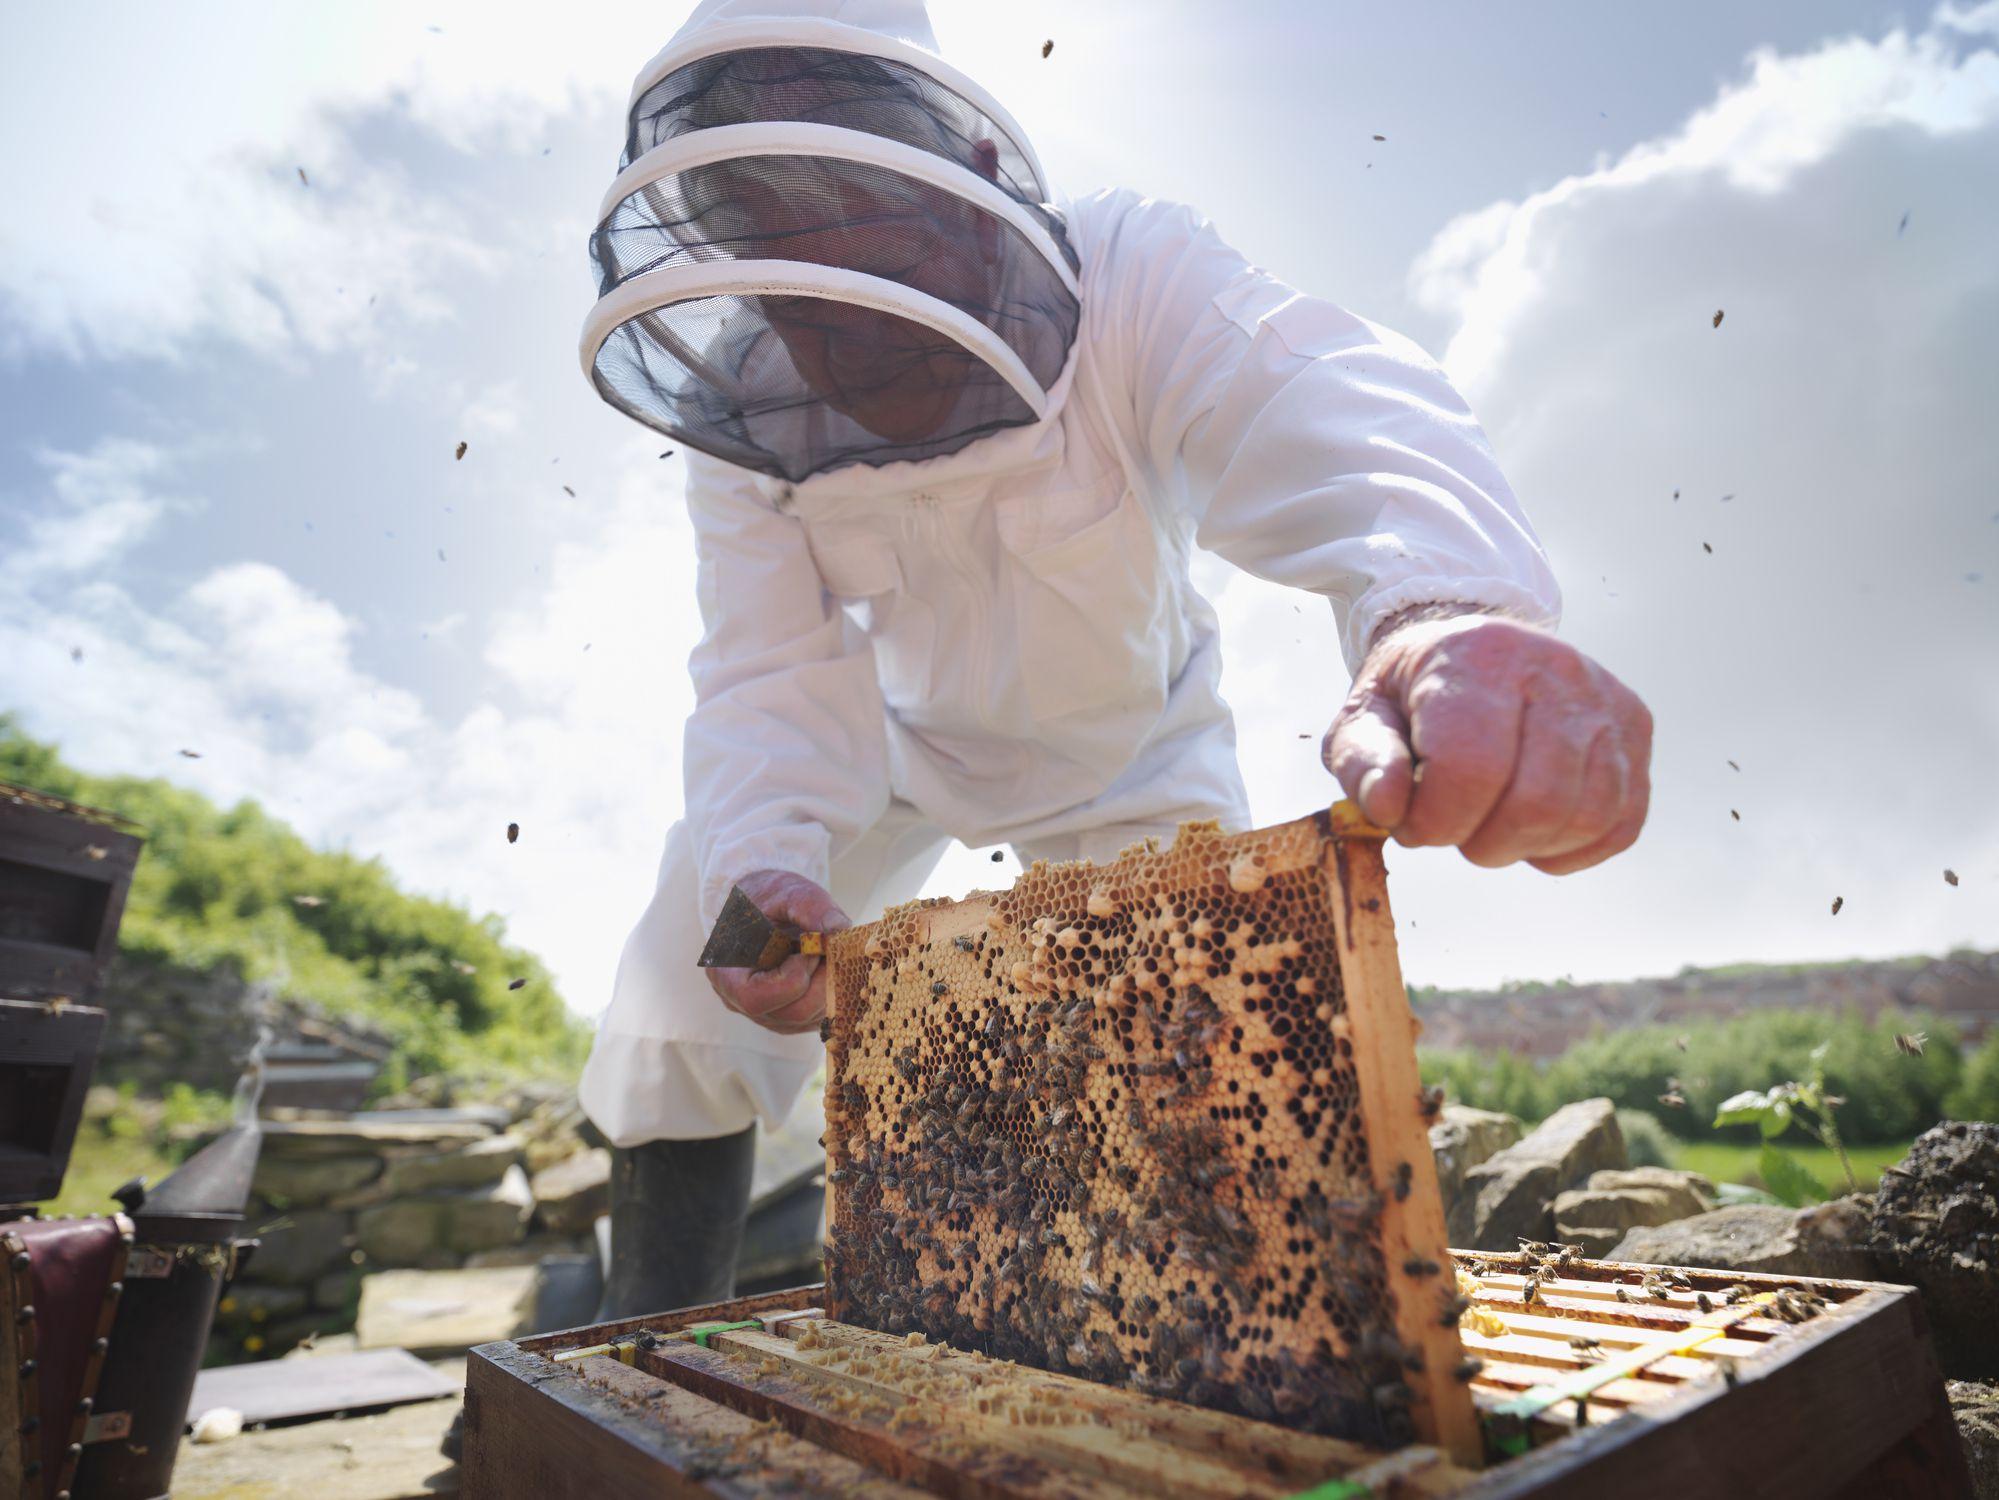 beekeeper career profile and job outlook